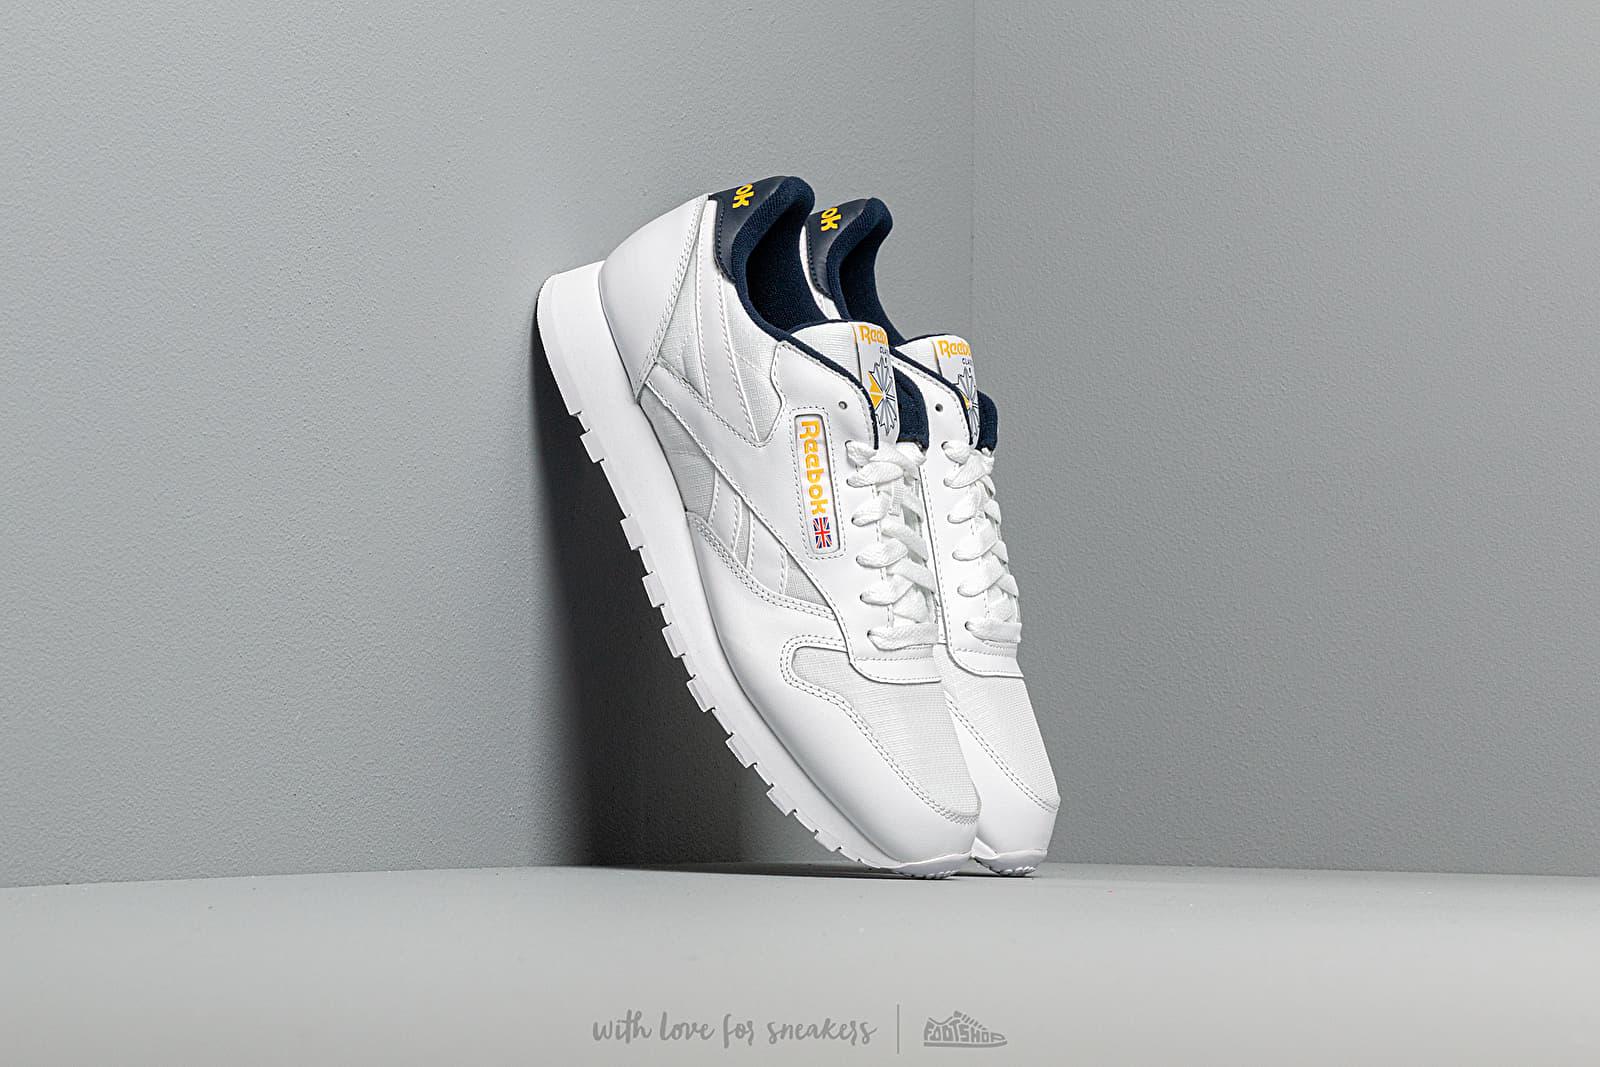 Pánské tenisky a boty Reebok Classic Leather MU White/ Collegiate Navy/ Yellow